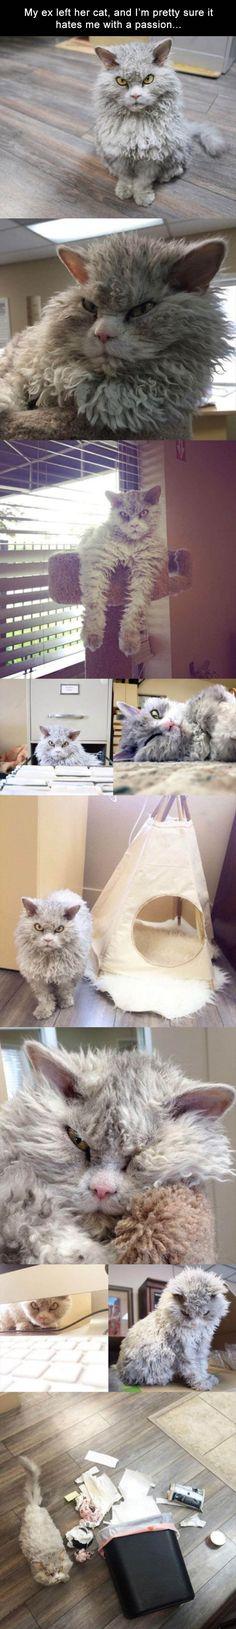 Lustige Tier Memes des Tages – 32 Bilder – Lovely Animals World … - Tiere Malen Funny Animal Memes, Funny Animal Pictures, Cat Memes, Funny Animals, Cute Animals, Funny Memes, Memes Humor, Funniest Memes, Grumpy Cat